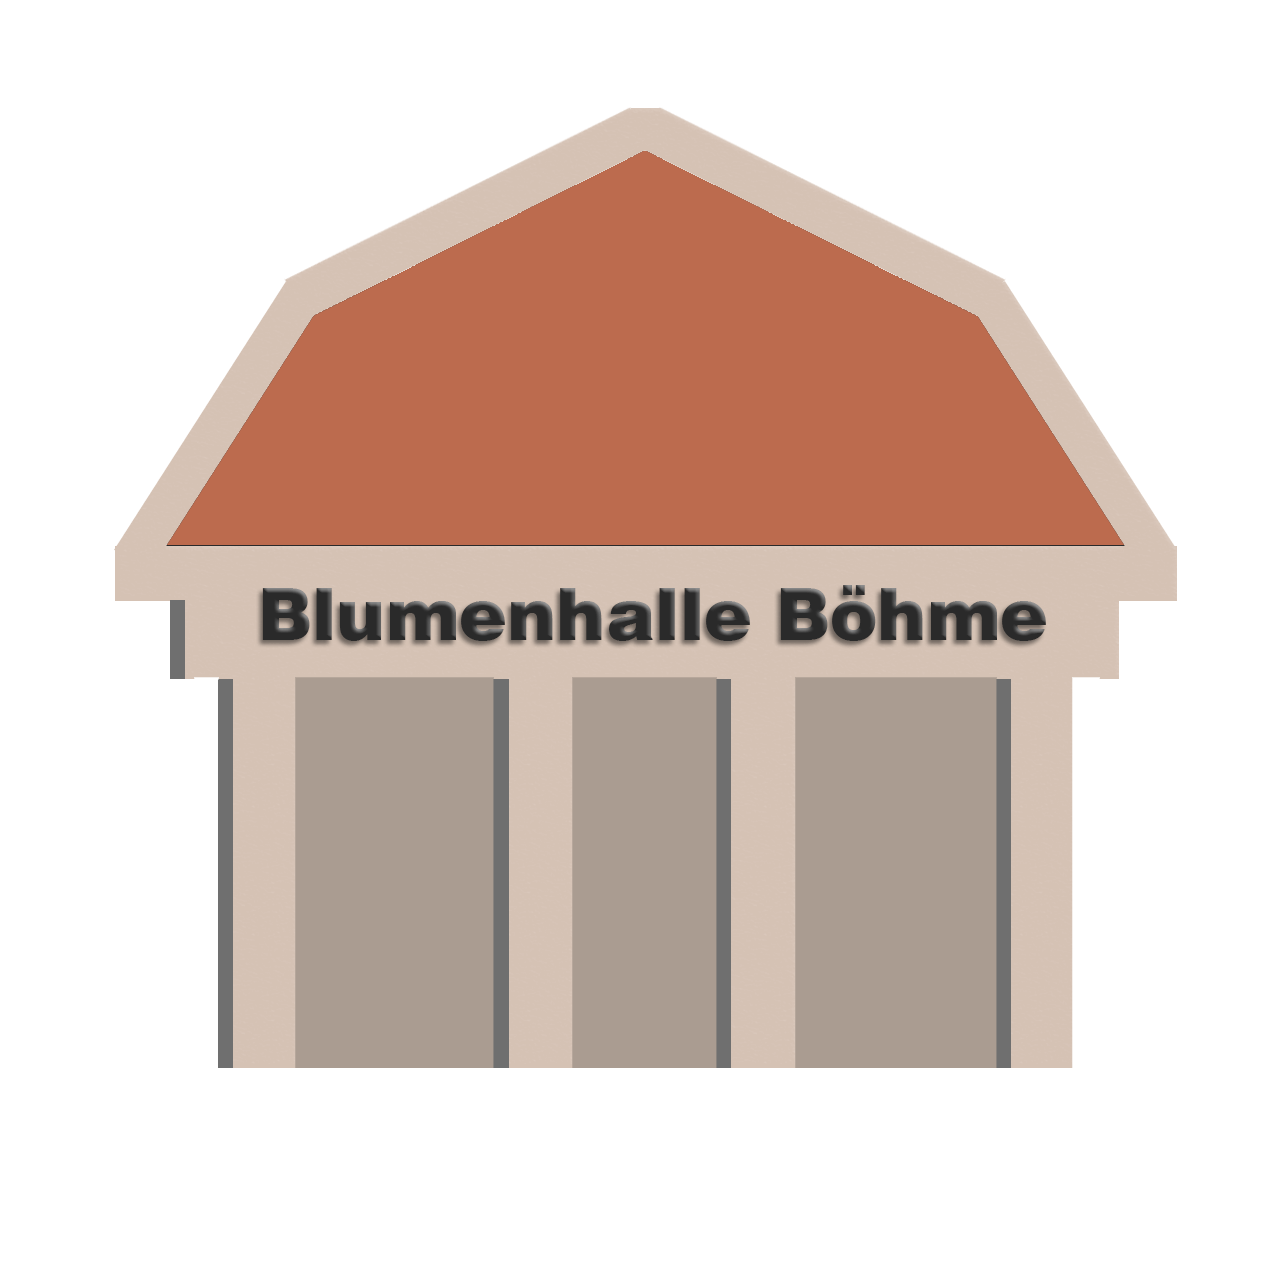 Blumenhalle Böhme